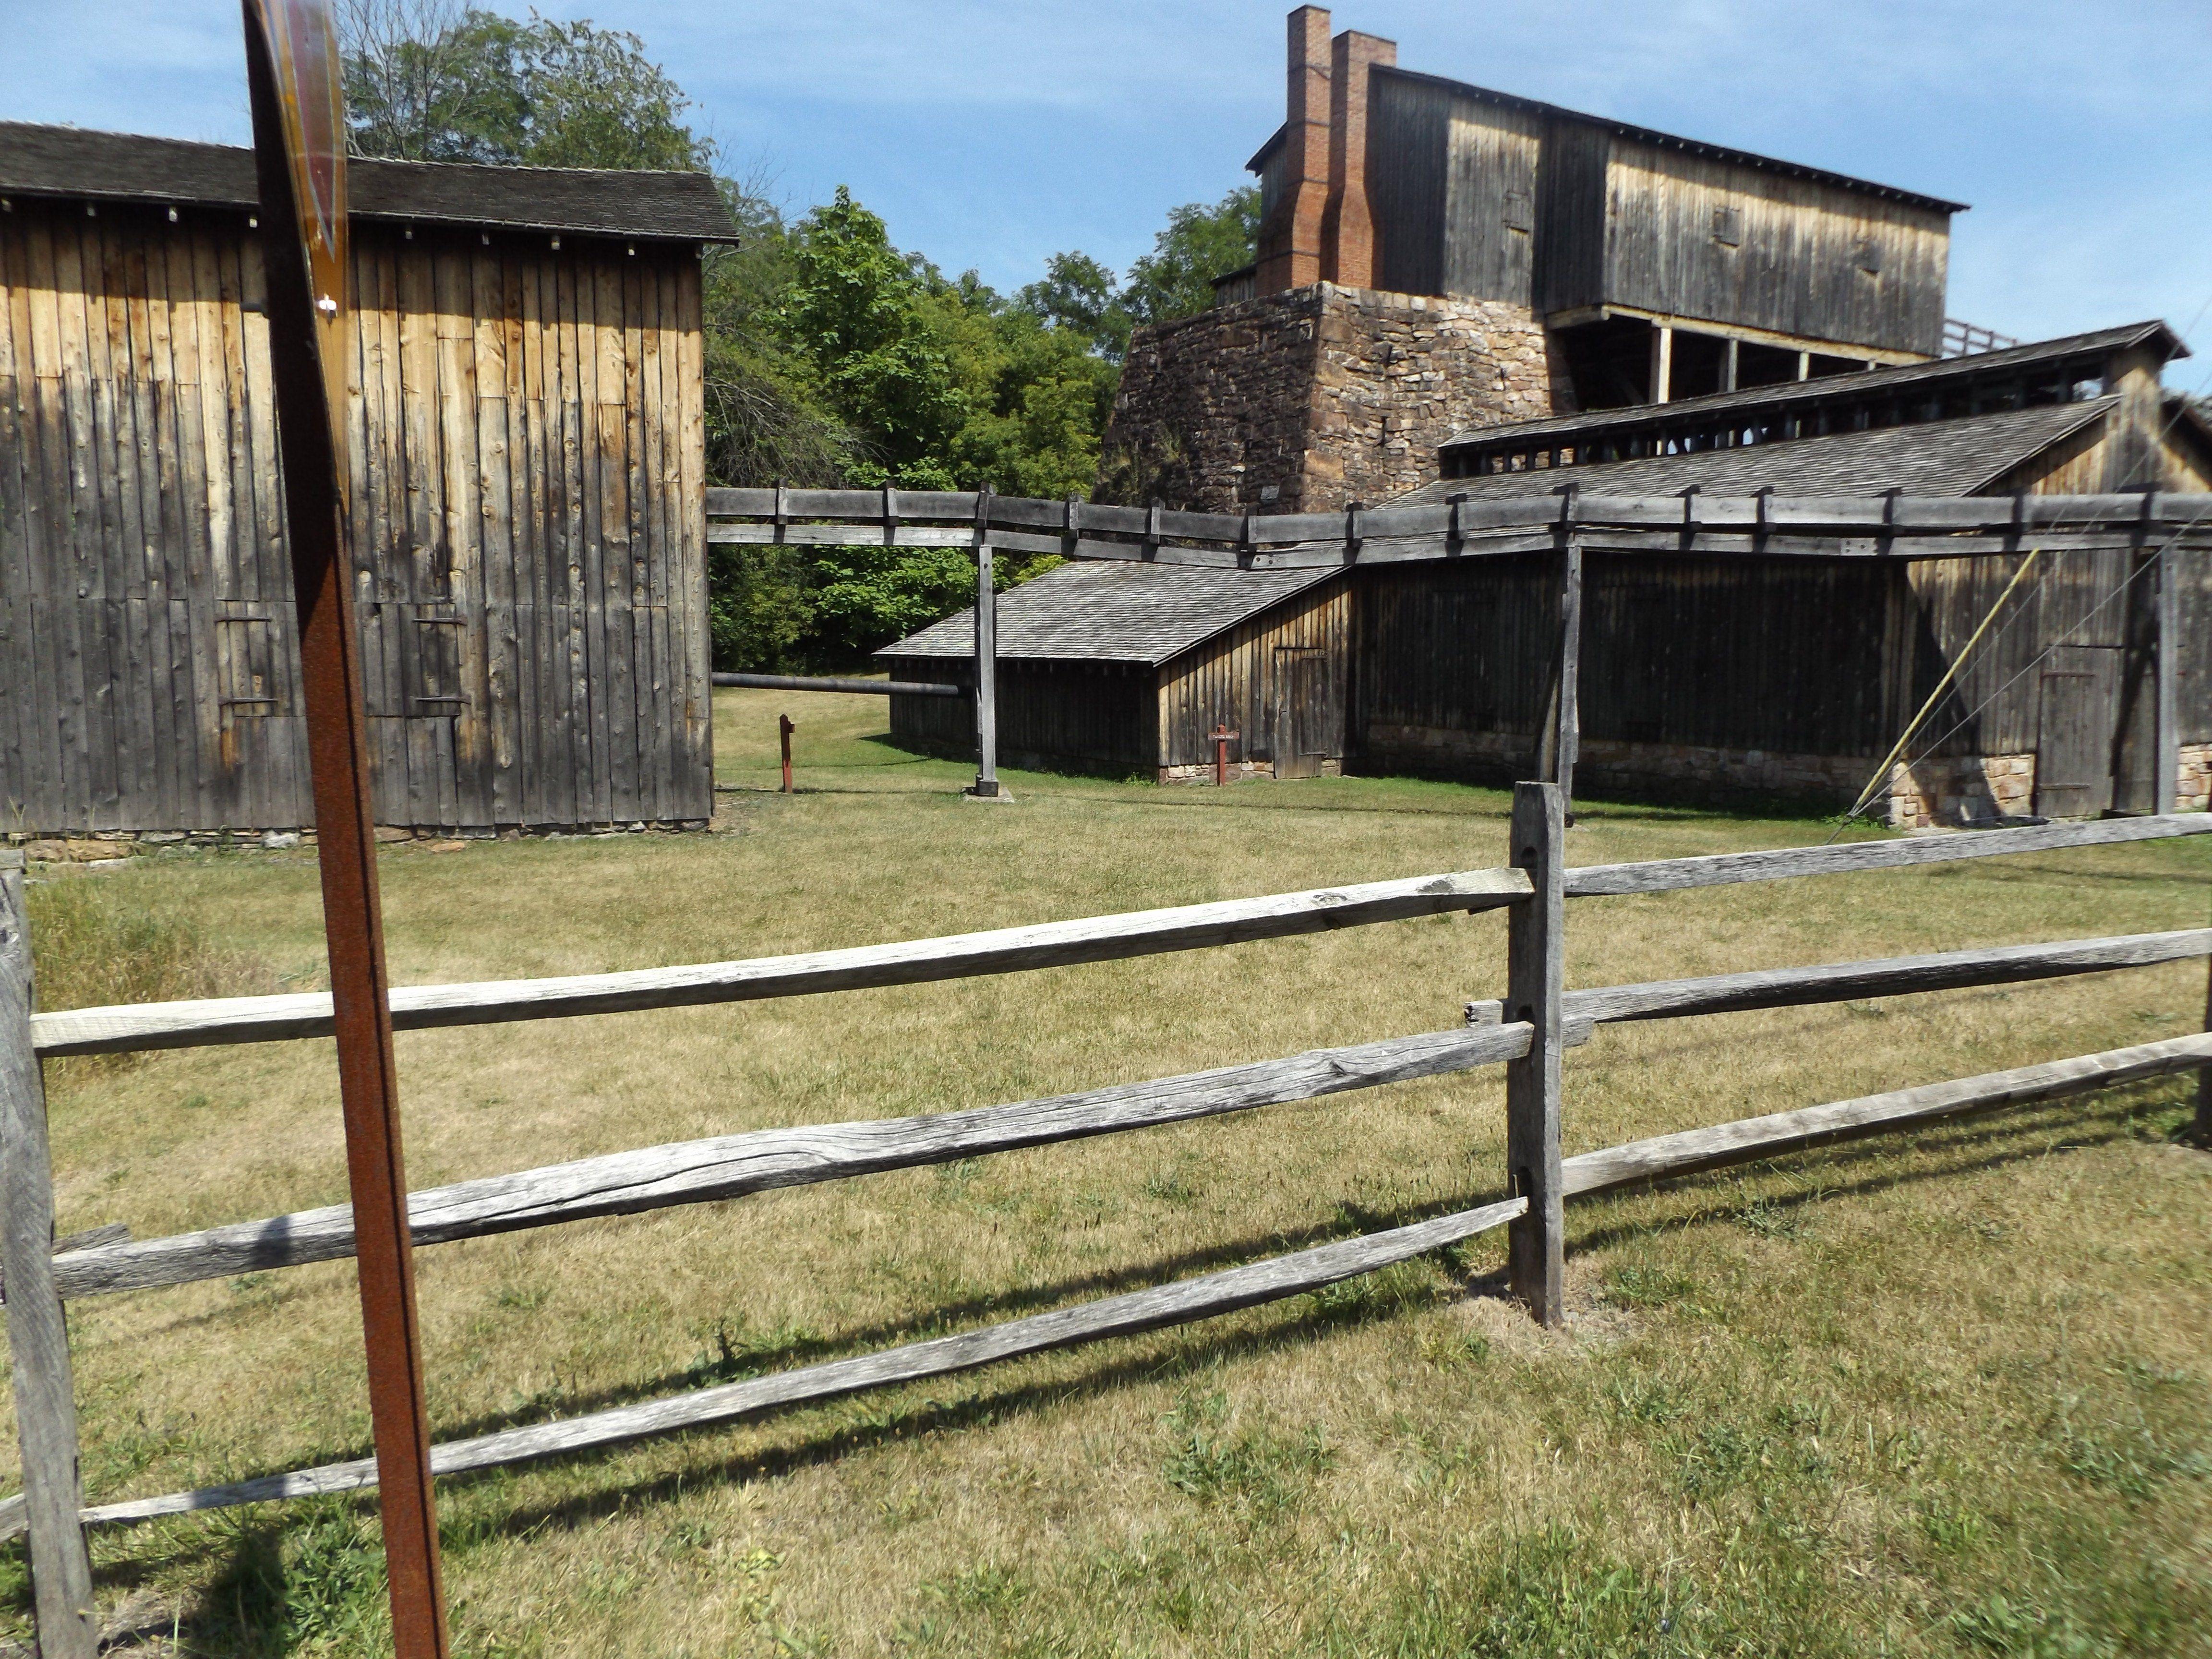 Eagle Furnace (Curtin Furnace), Curtin, Pennsylvania